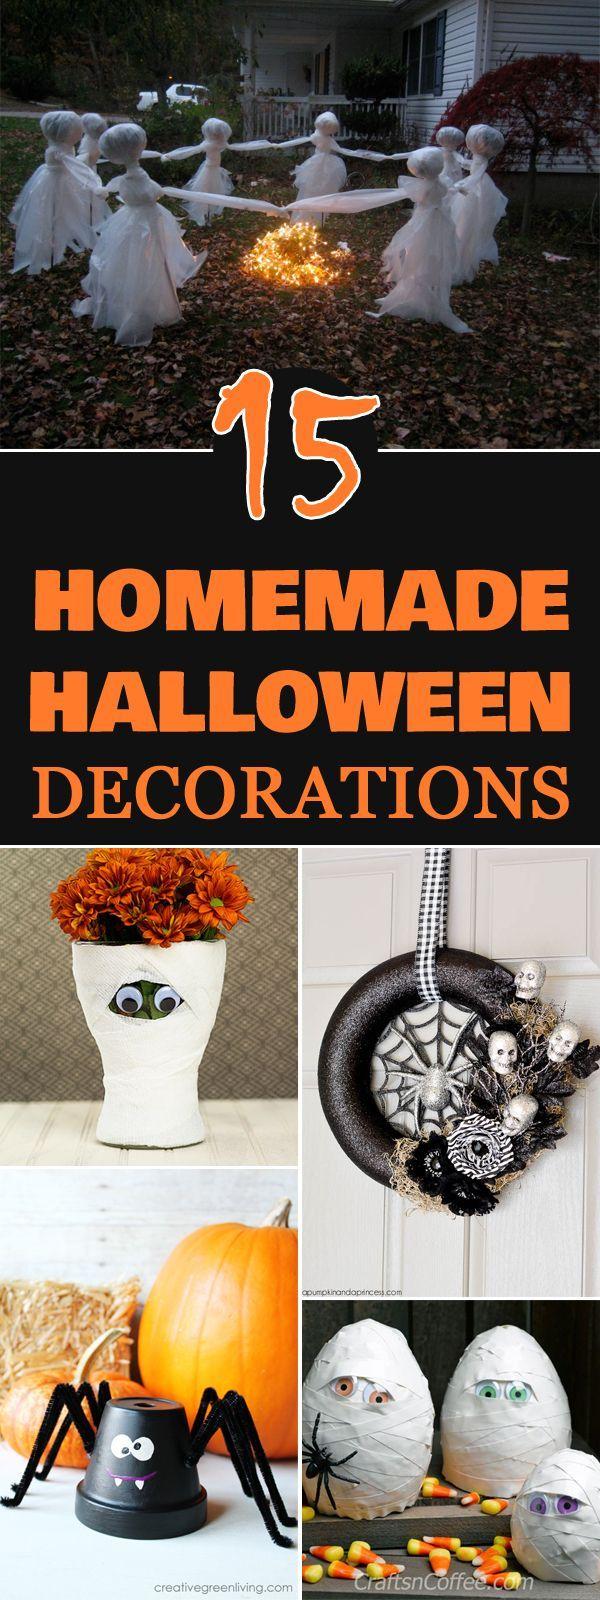 "diytotry: "" 15 Easy Homemade Halloween Decorations ..."